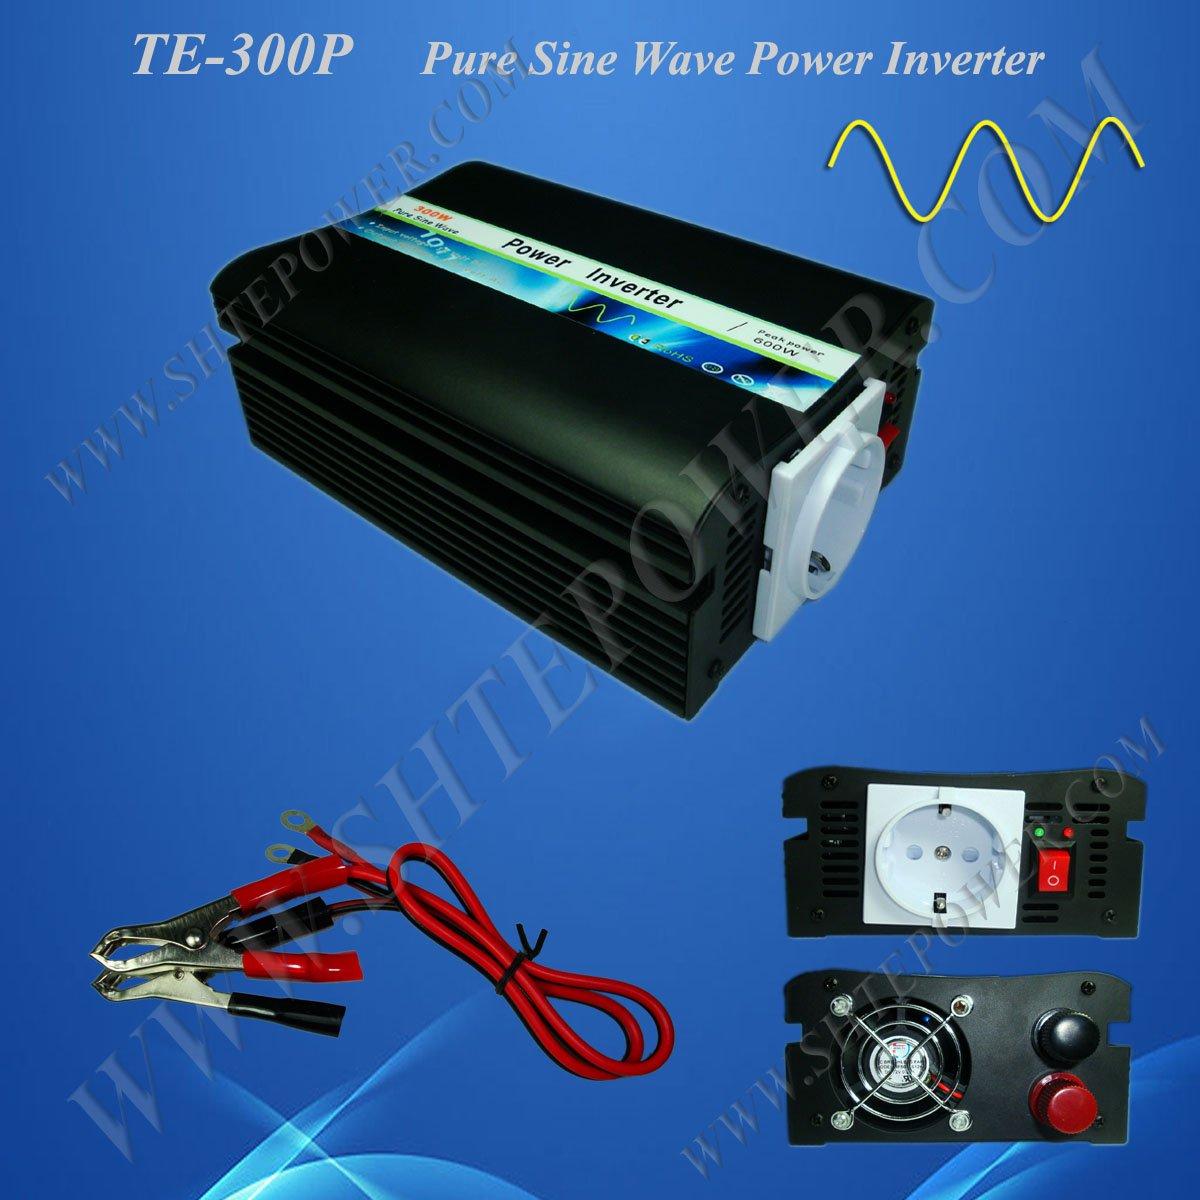 ... Sine-Wave-Inverter-dc-12v-24v-to-AC-100v-110v-120v-220v-230v-240v.jpg